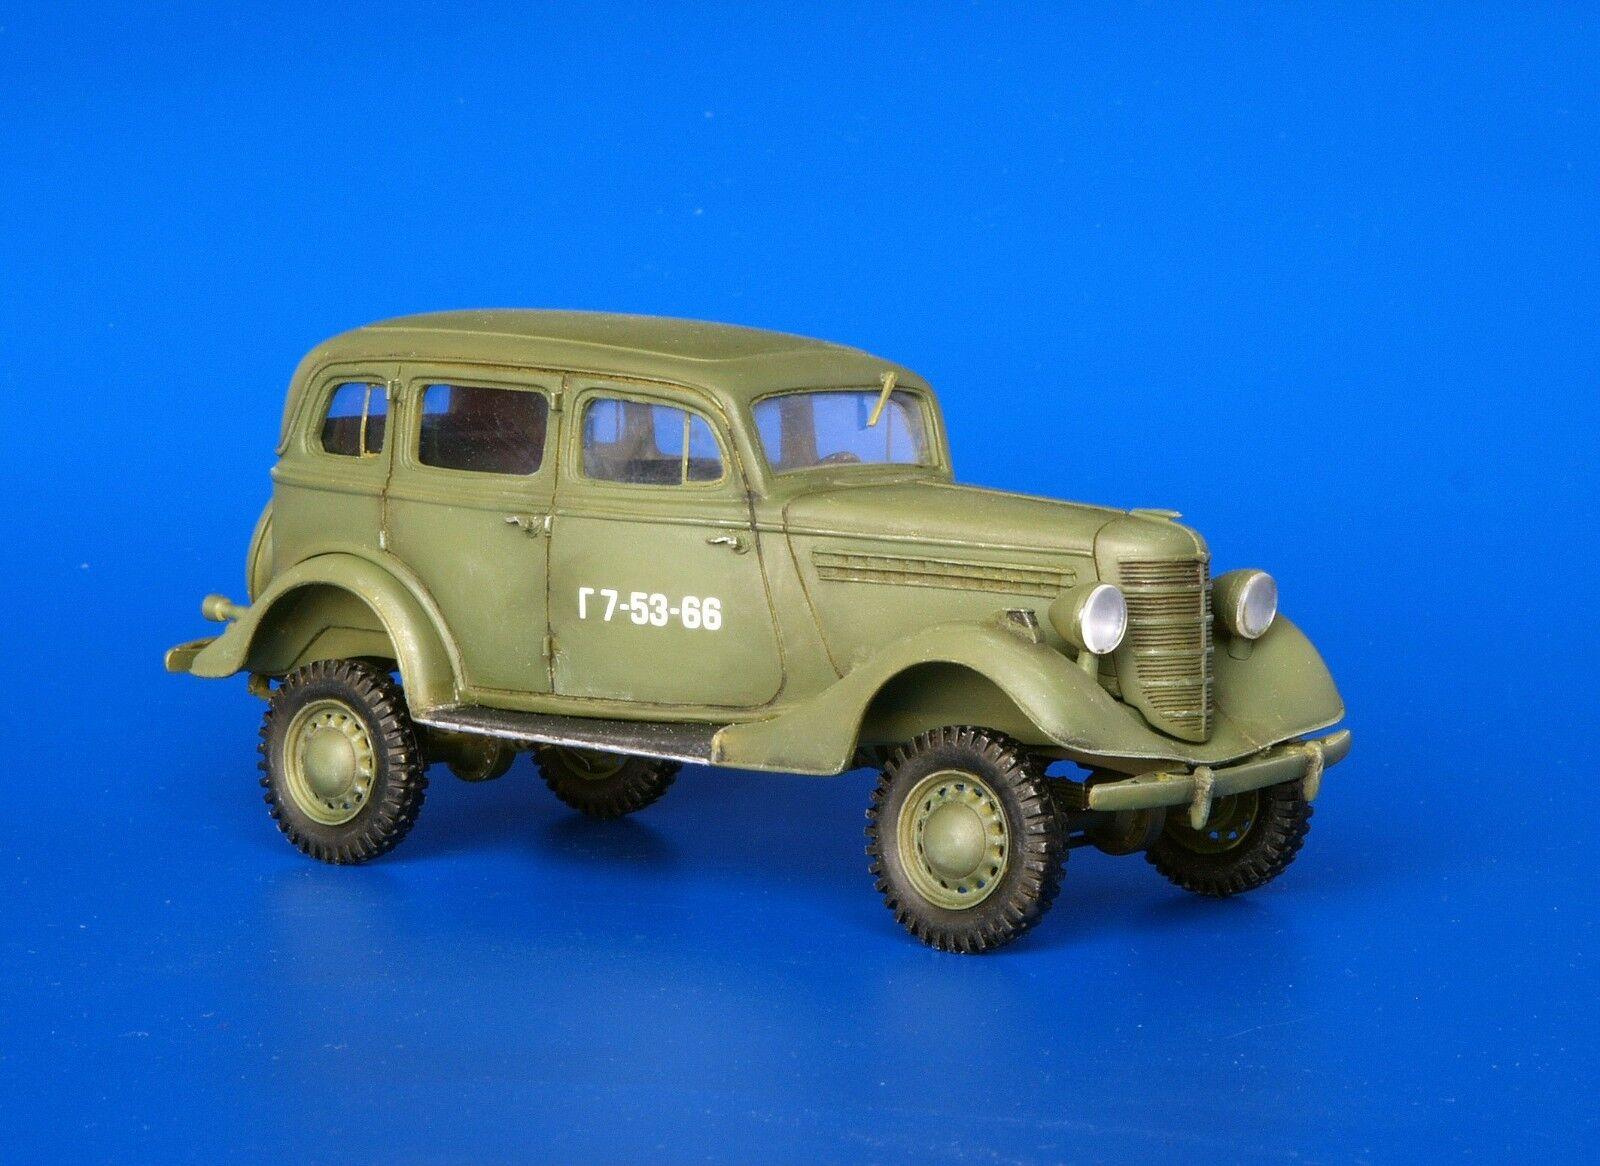 Plus Model 239 GAZ 61-73 4x4 Car 1 35 scale resin model kit